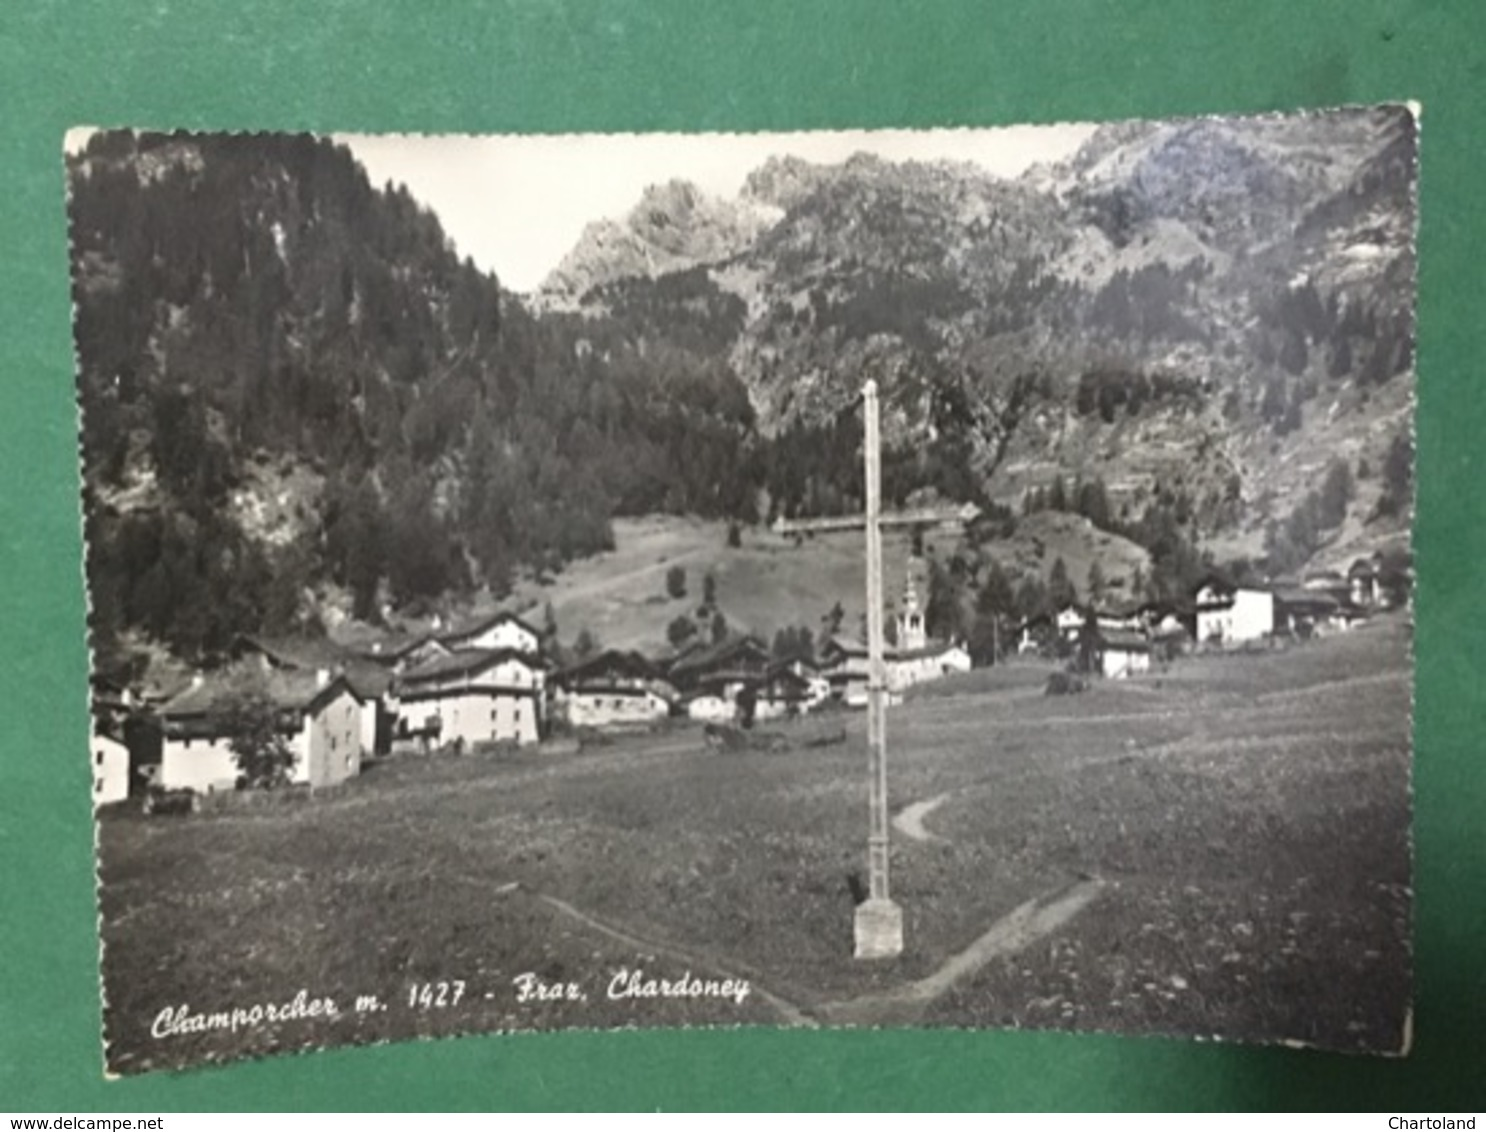 Cartolina Champorcher - Fraz. Chardoney - 1954 - Unclassified